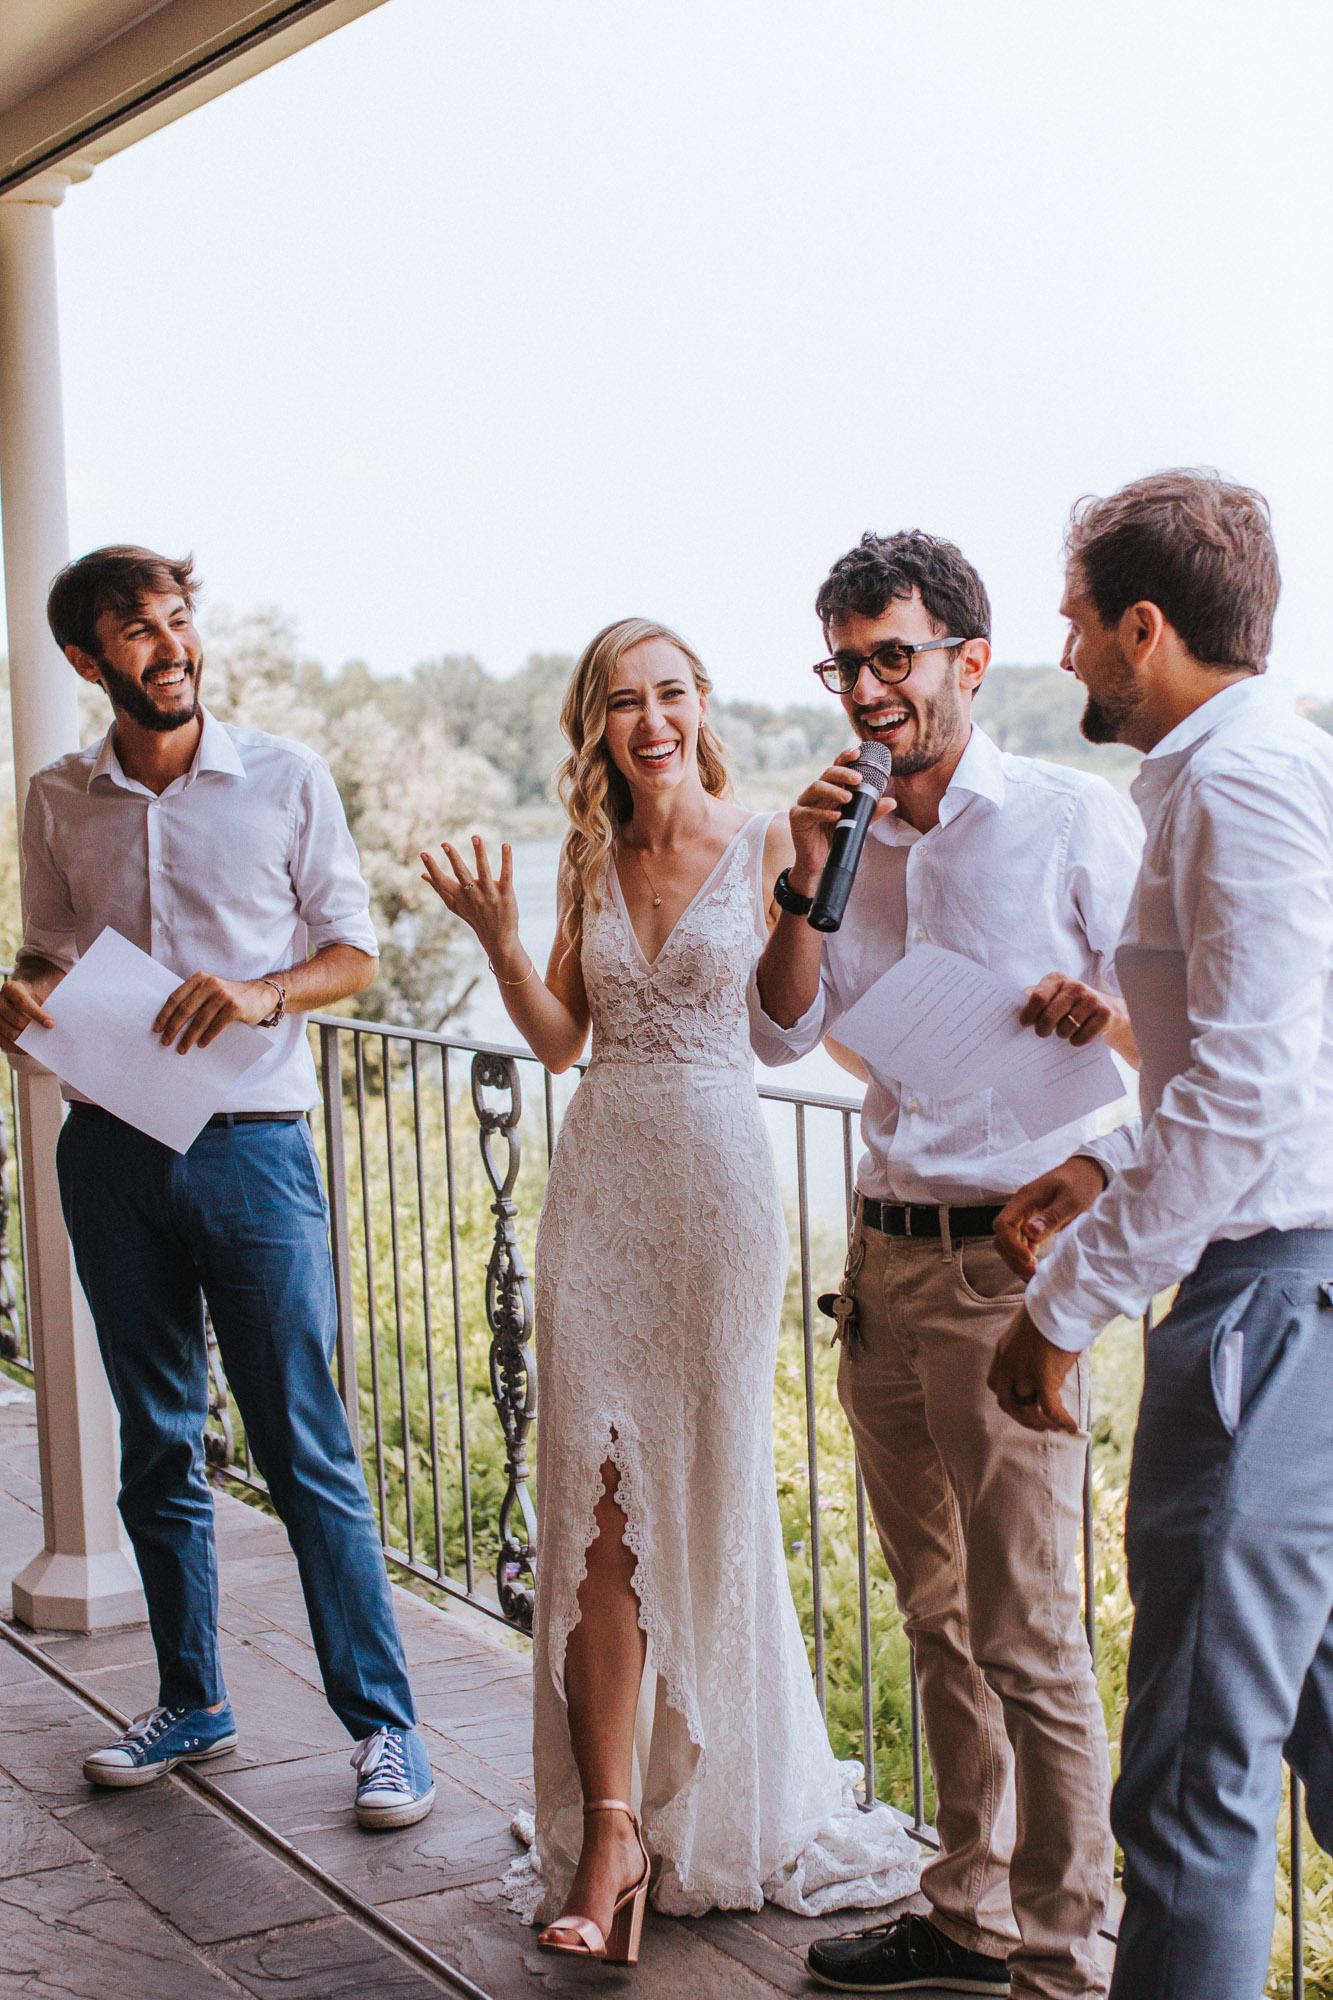 20180720-Memoryfactory-Sara&Jacopo-84- Hochzeit.jpg